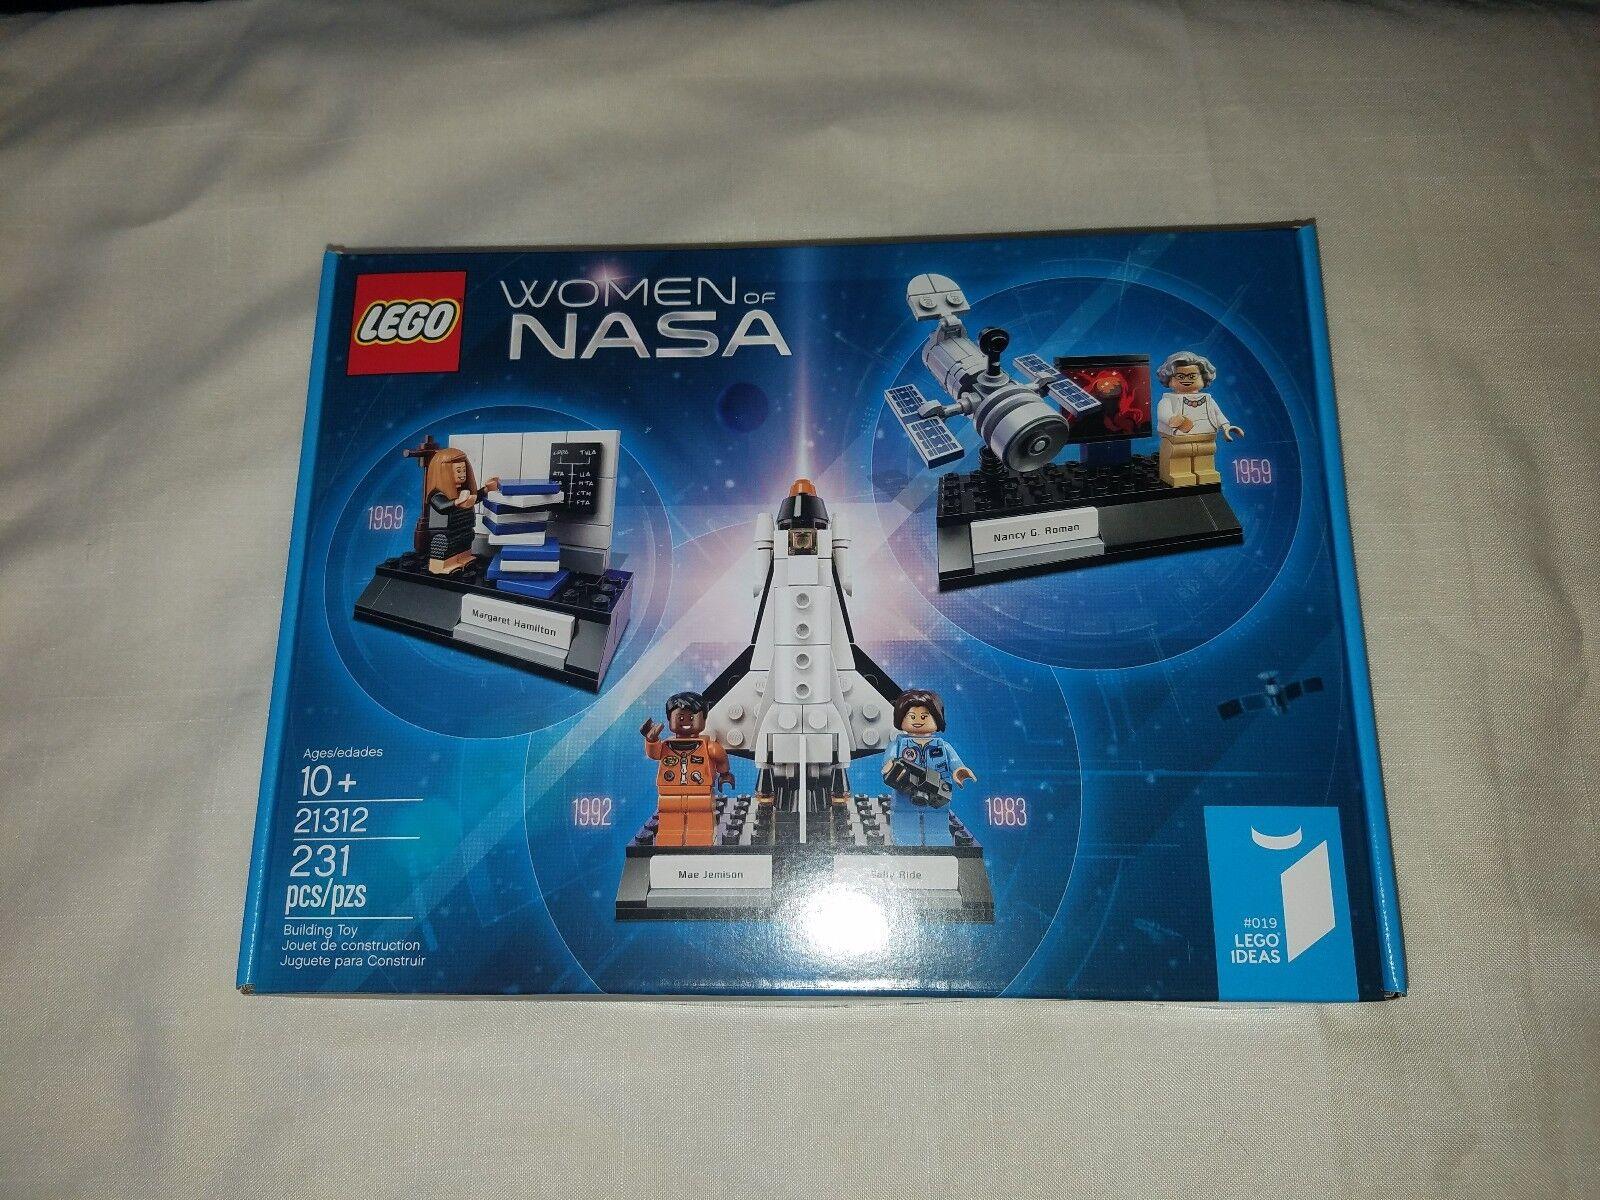 Lego 21312 Damens of NASA Building Set 231 Pieces 10+ Hamilton Roman Jemison Ride